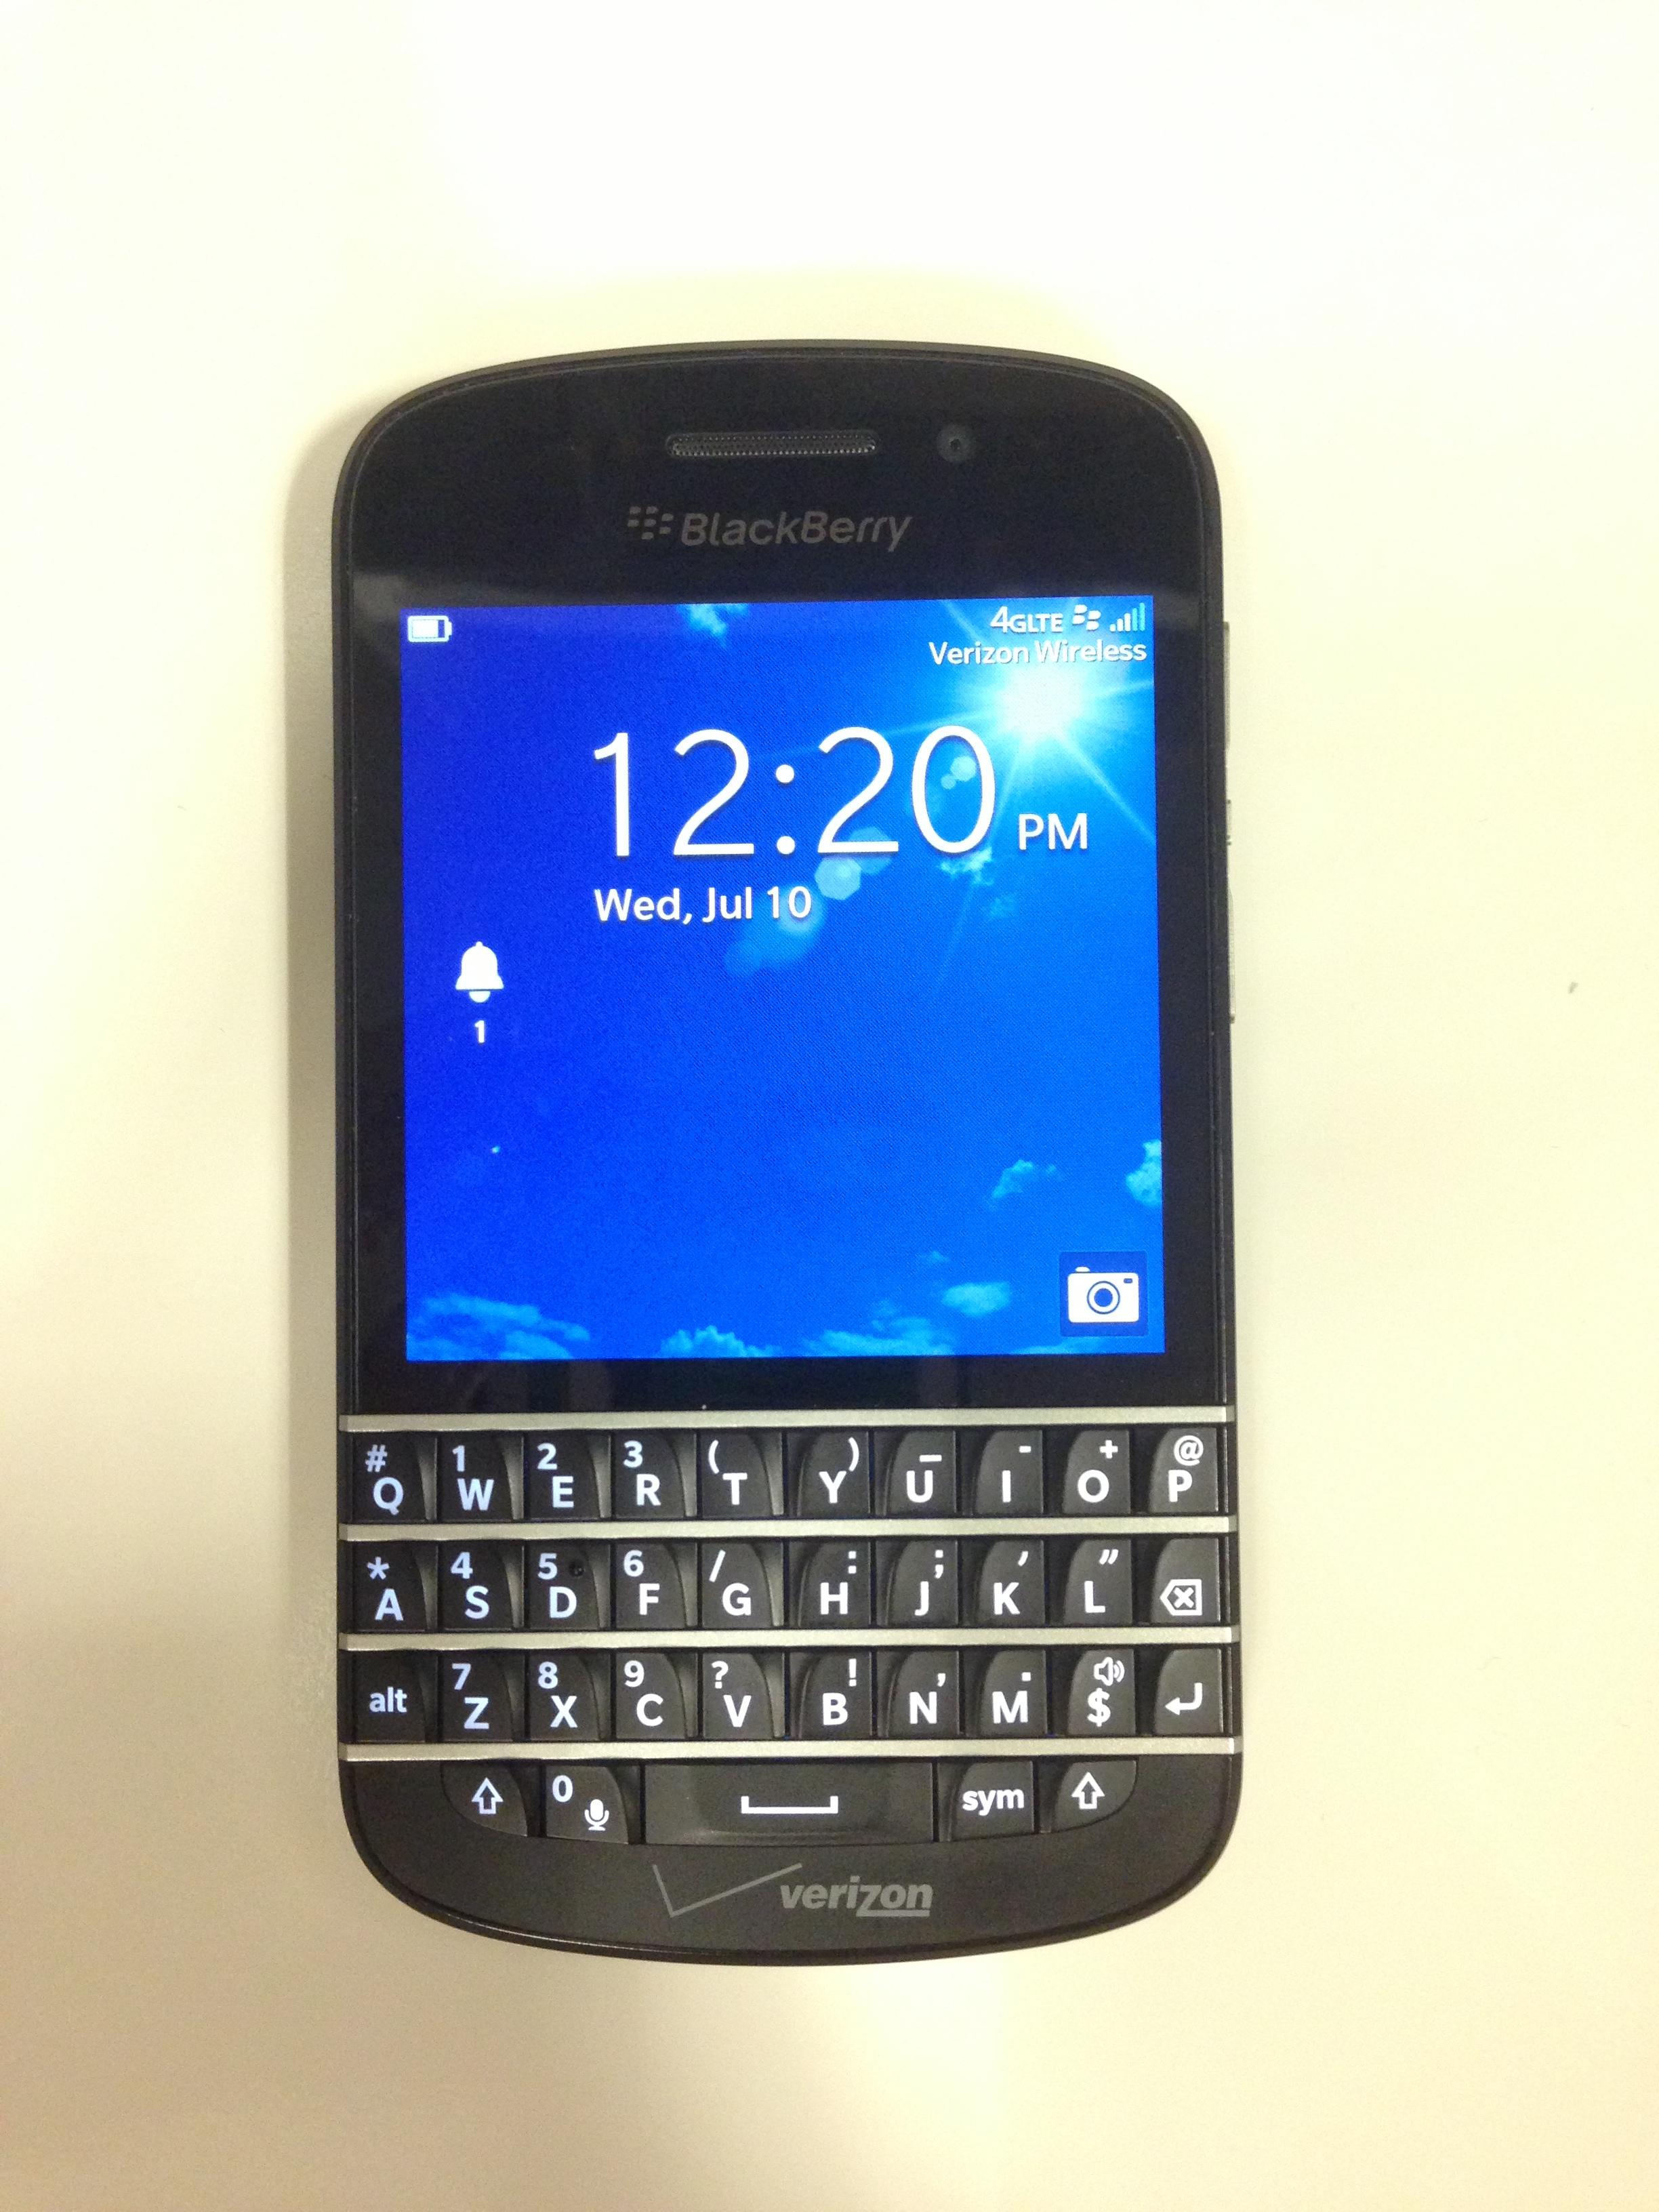 BlackBerry Q10 on Verizon Wireless - What BB Fans Have Been